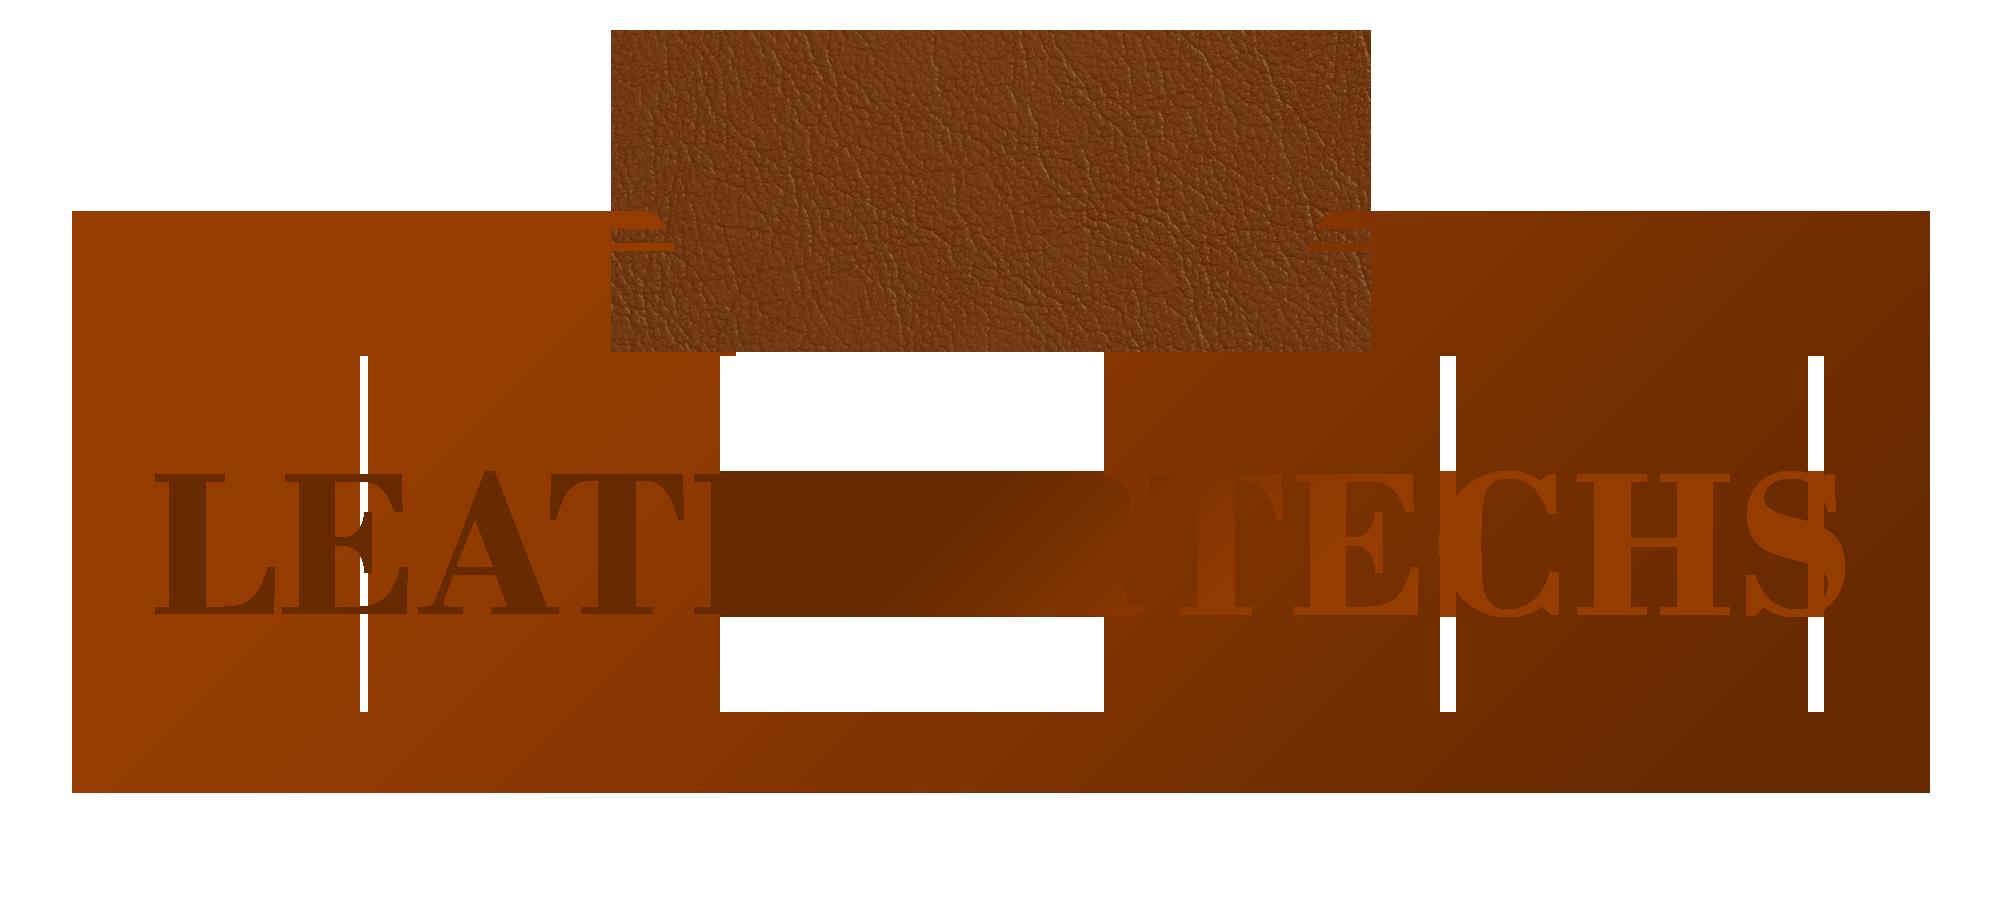 Leathertechs